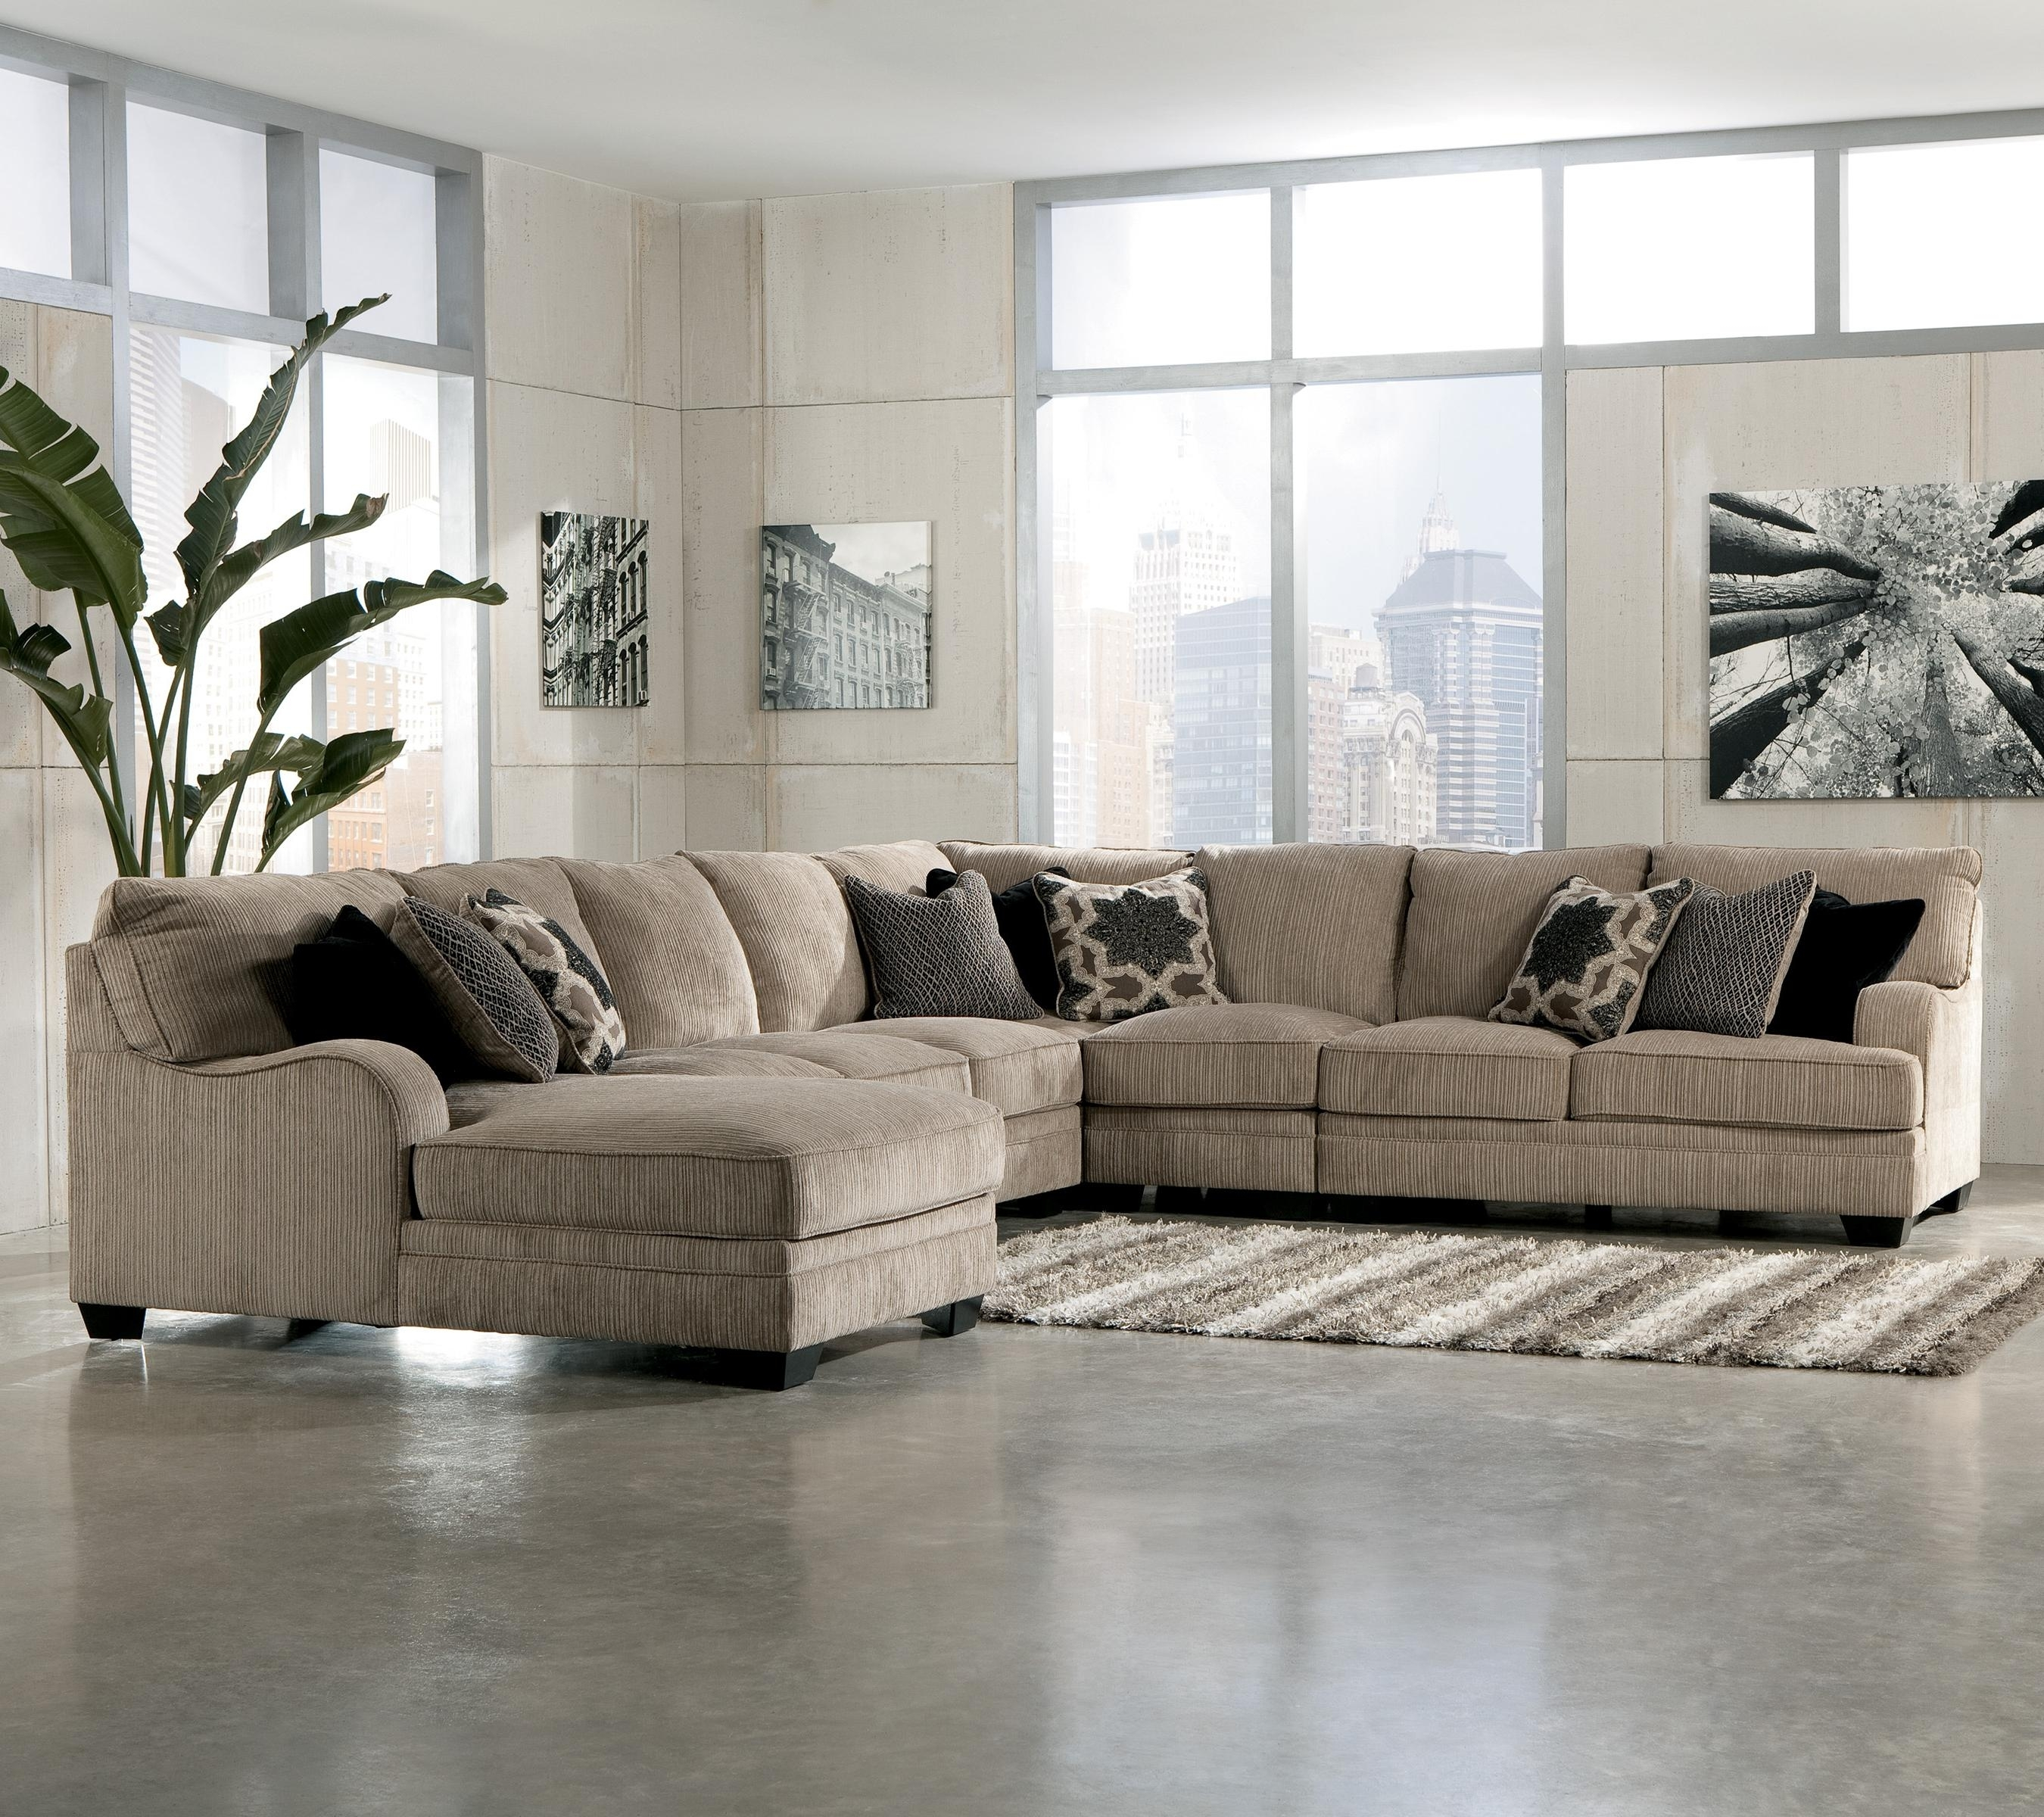 Furniture: Furniture Stores Jonesboro Ar | Jonesboro Furniture Regarding Pensacola Fl Sectional Sofas (View 1 of 10)